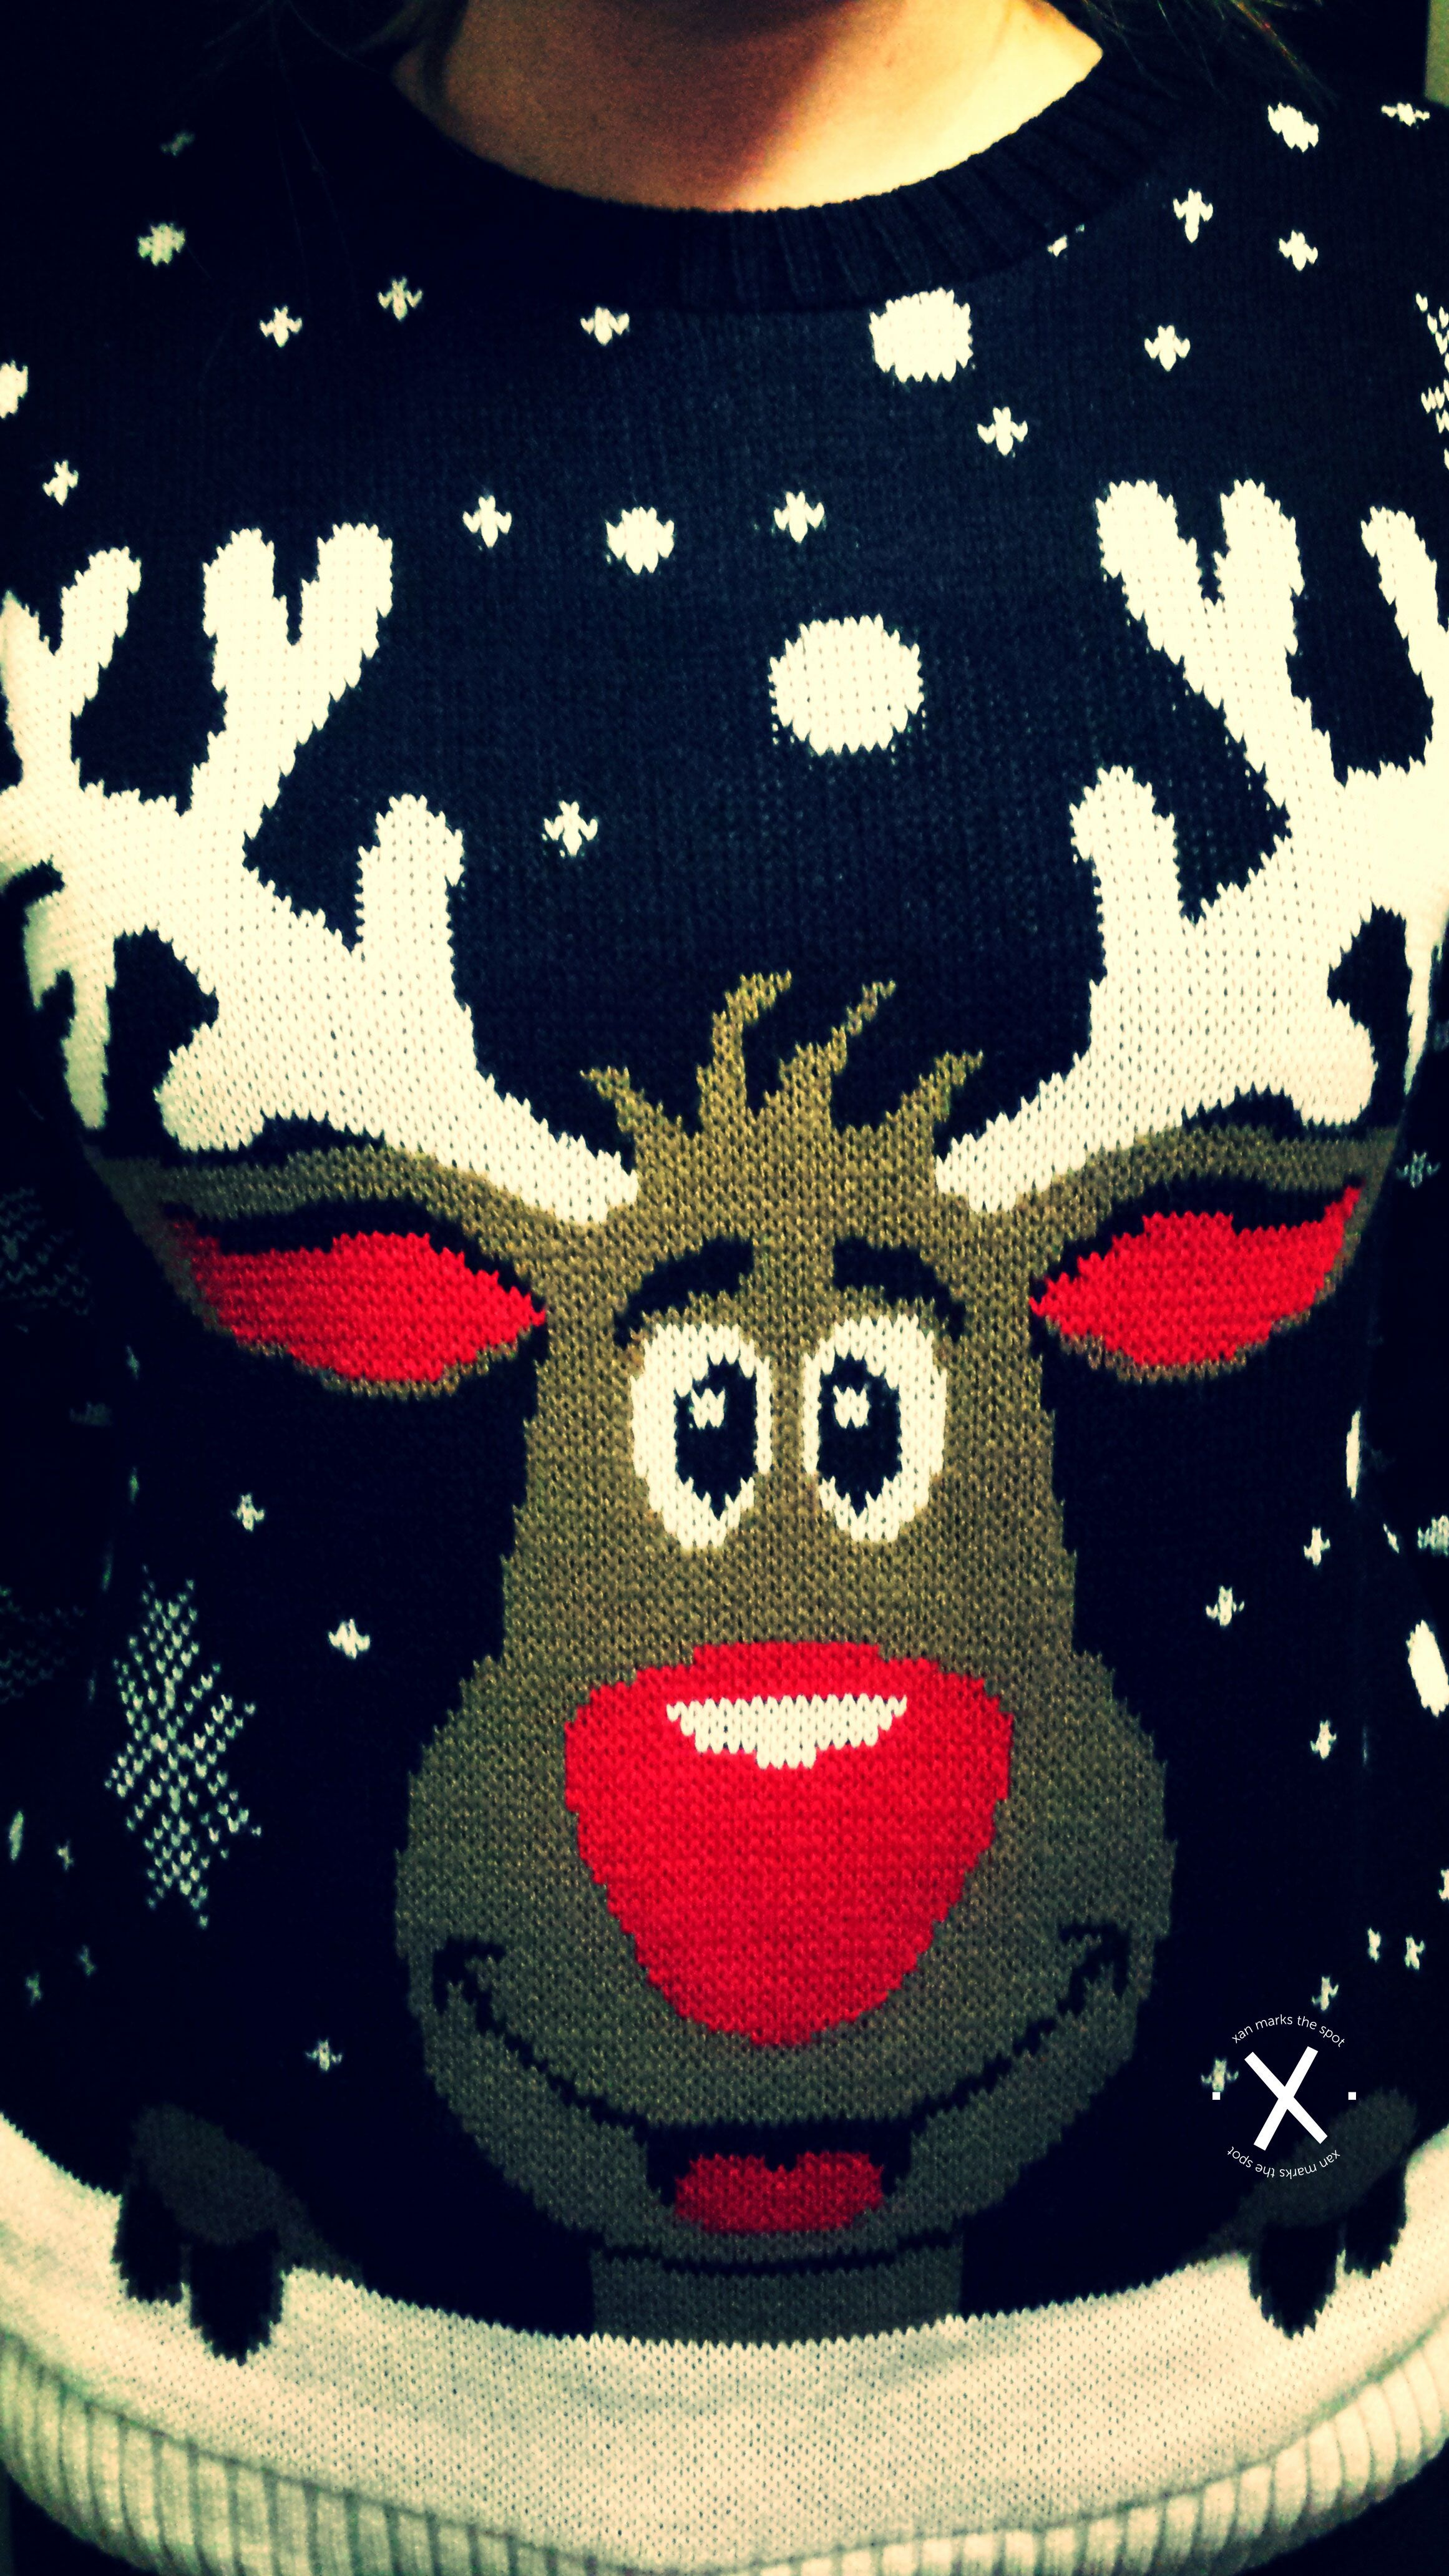 Kersttrui Ah.Foute Kersttrui Met Rudolph The Red Nosed Reindeer Ah Excellent